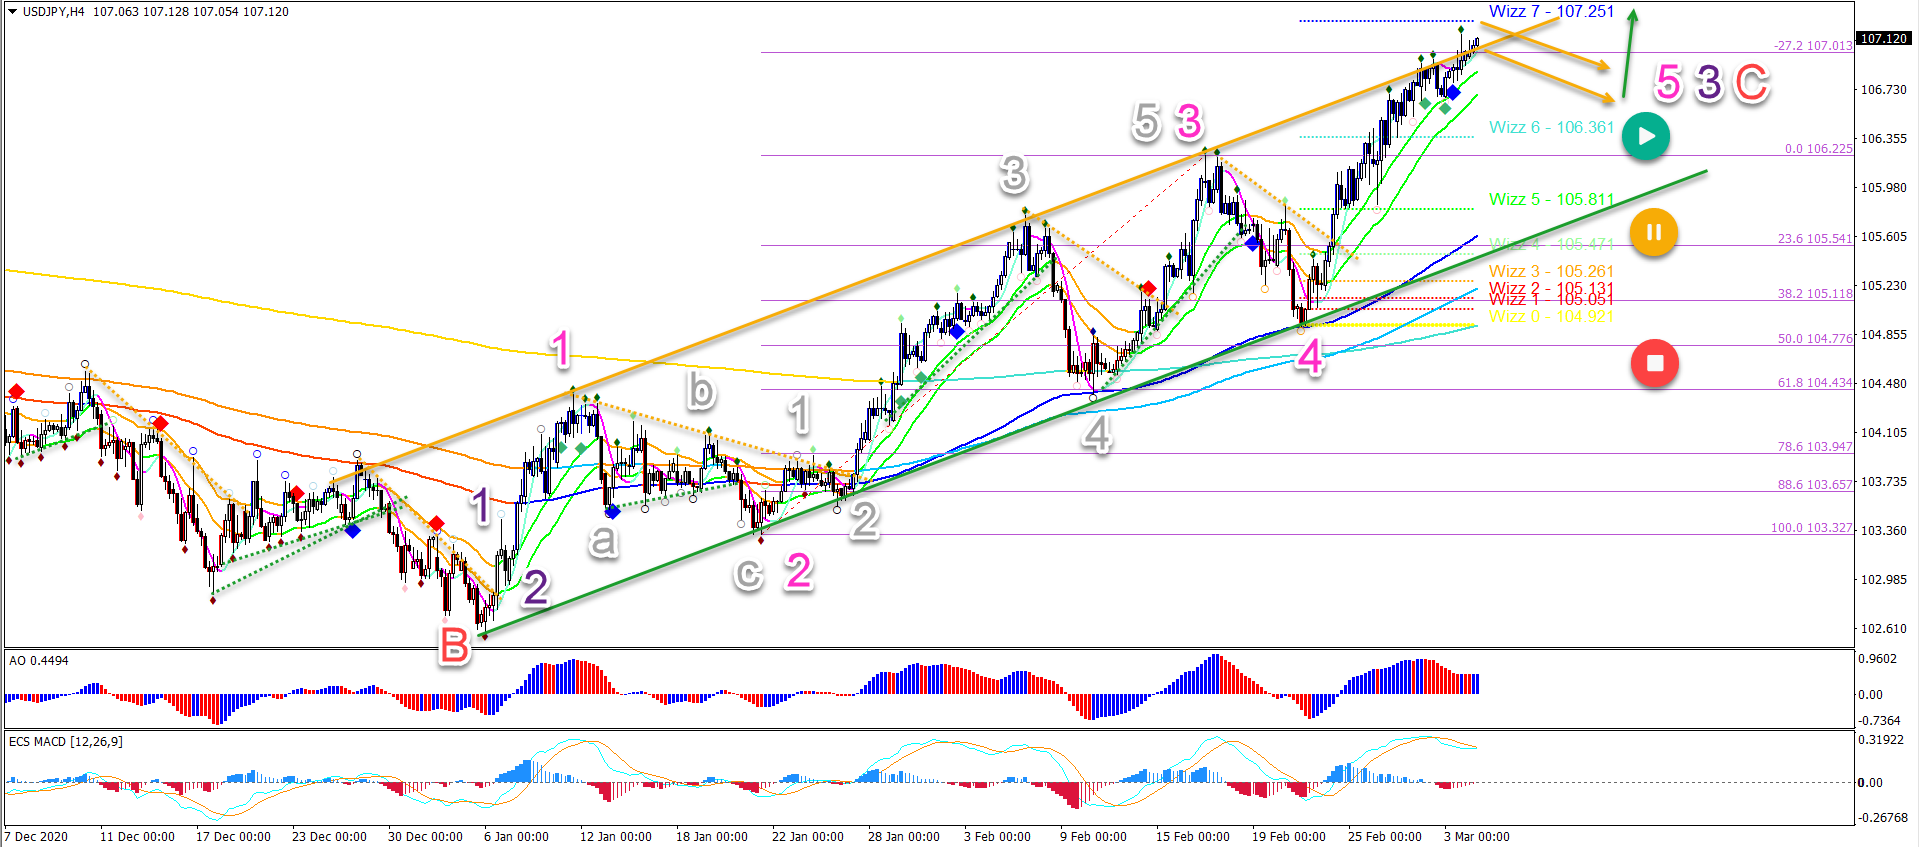 USD/JPY 04.03.2021 4 hour chart